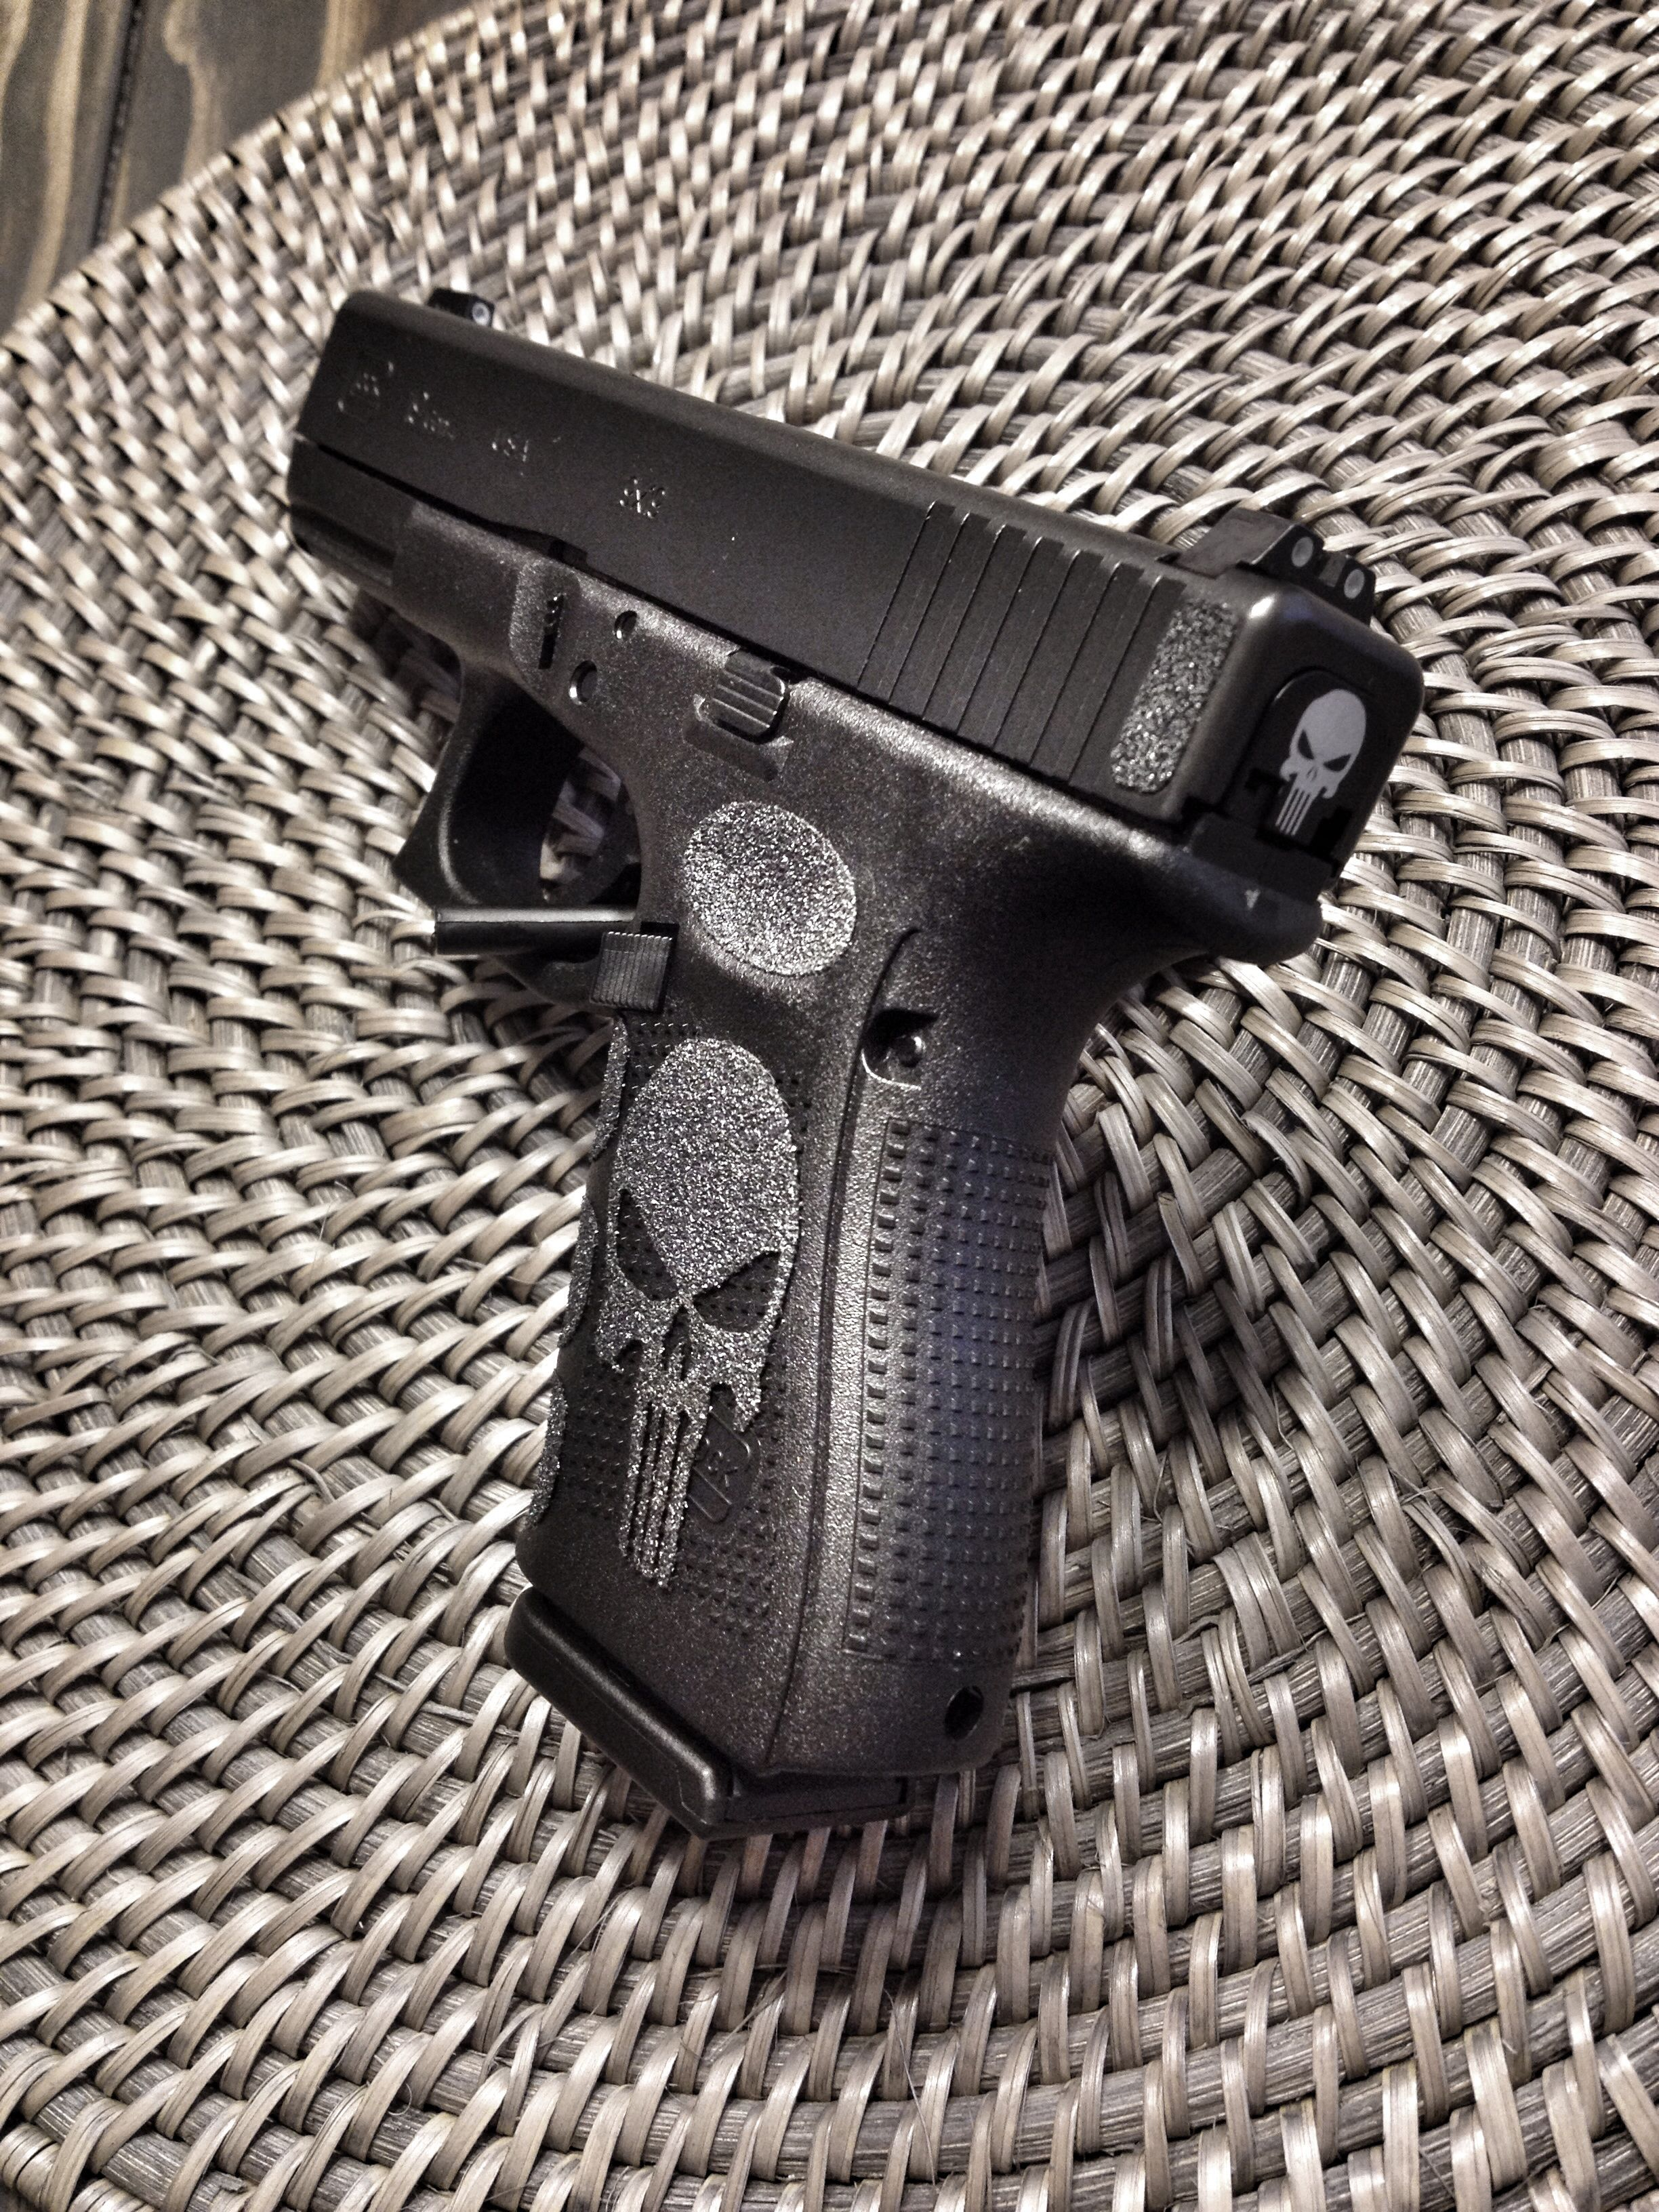 Pin on glocks